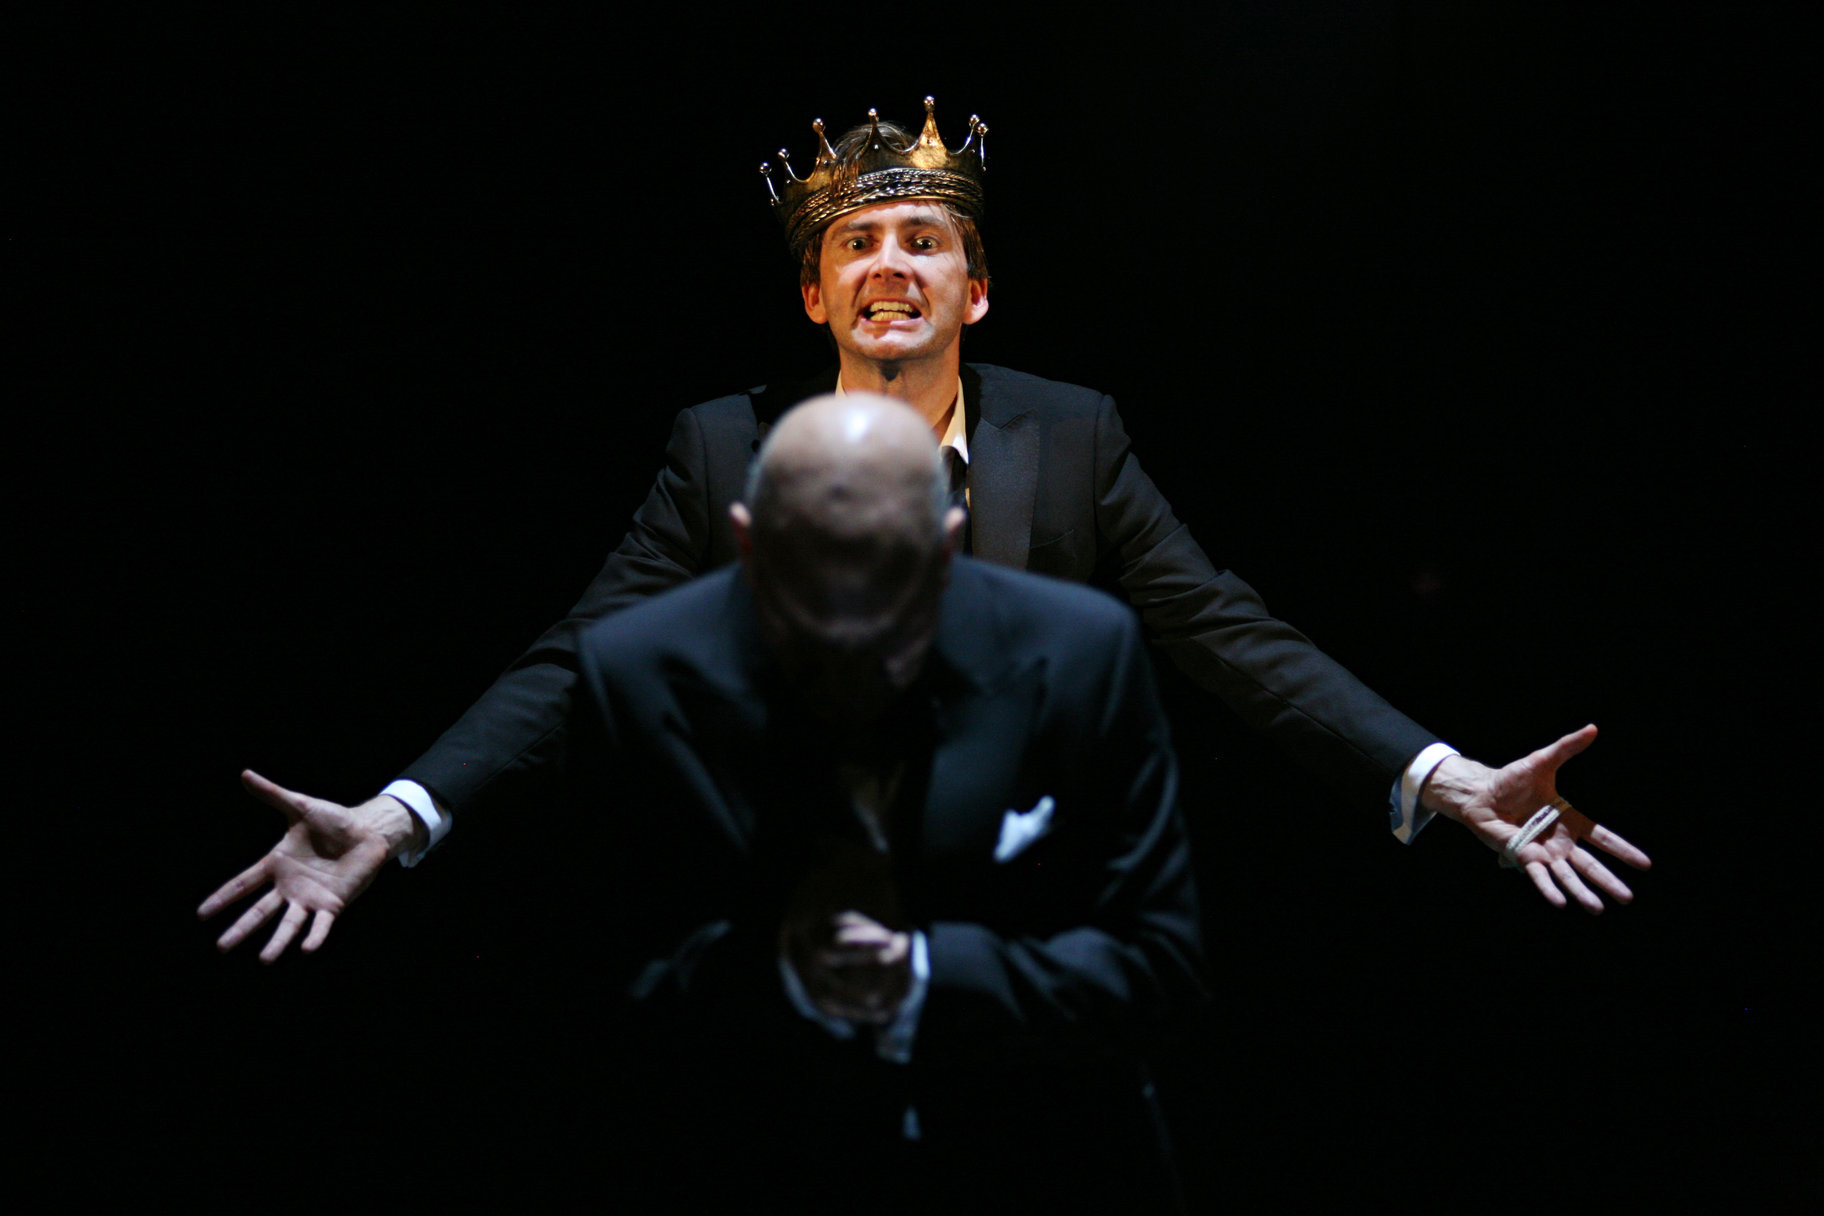 Hamlet stands behind Claudius as he prays.